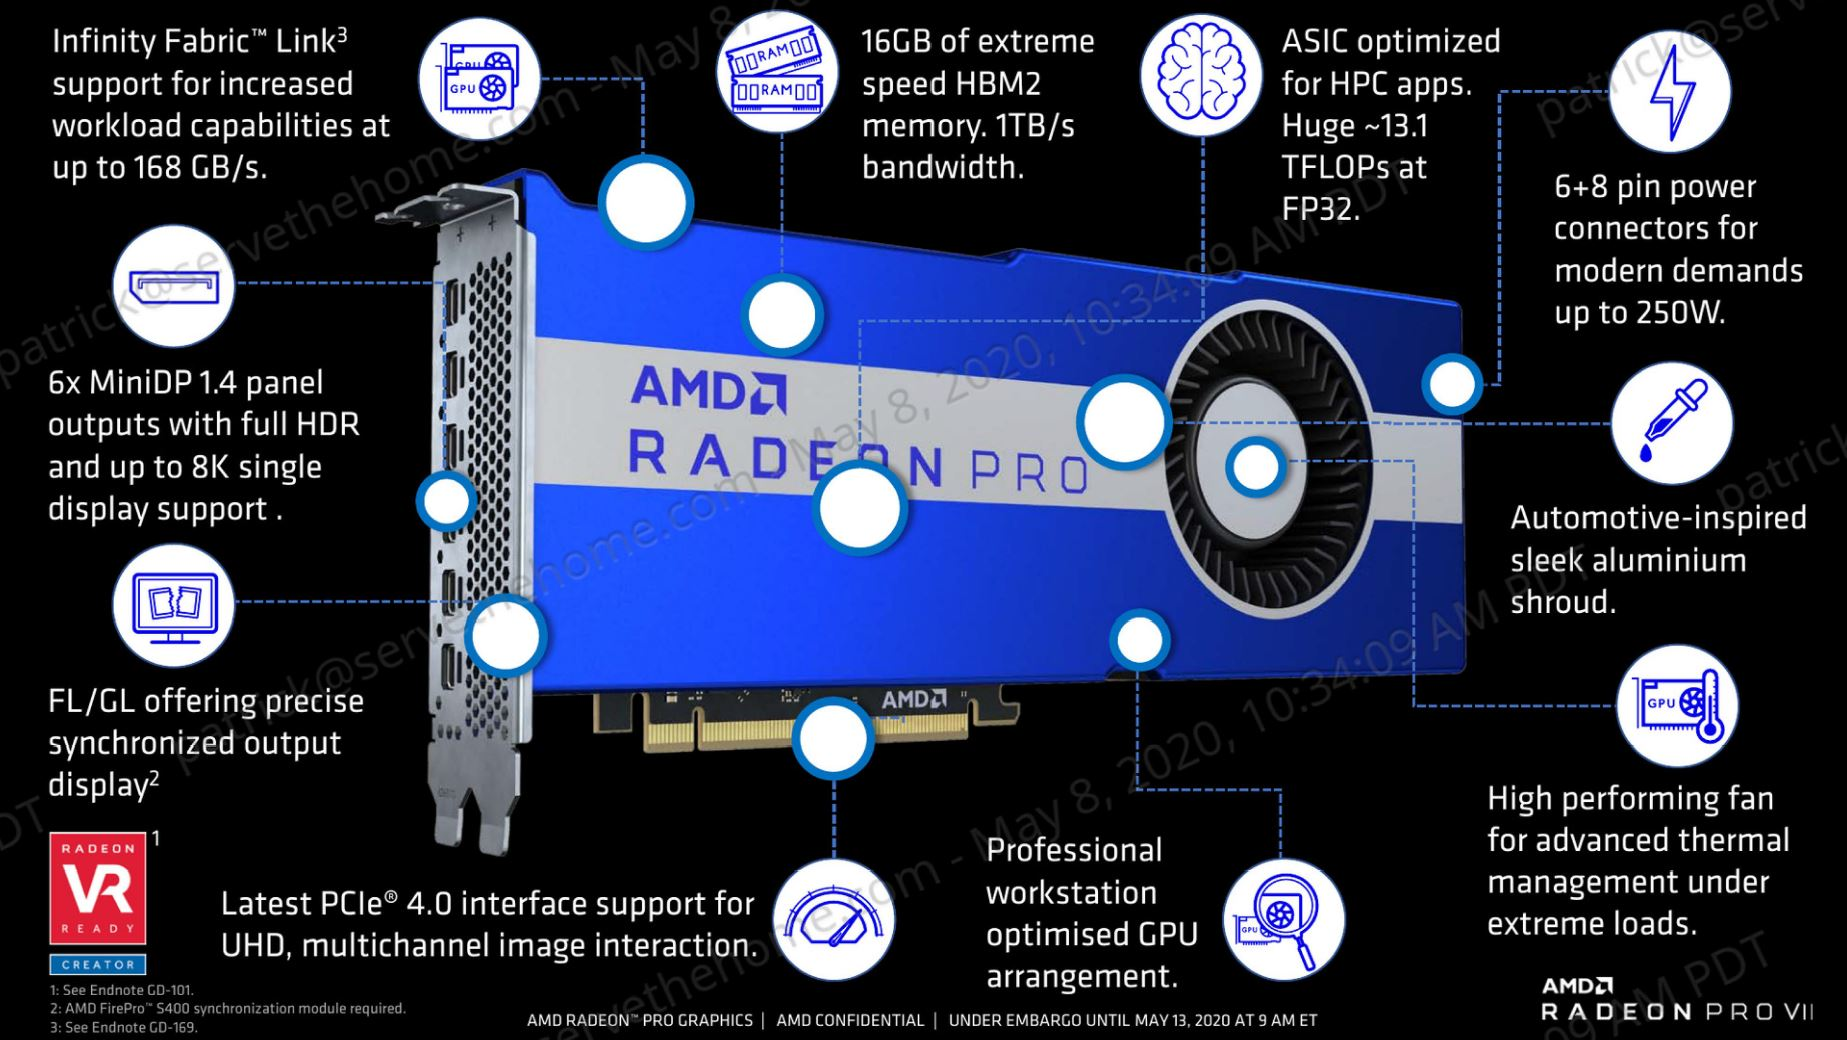 AMD Radeon Pro VII Overview Slide